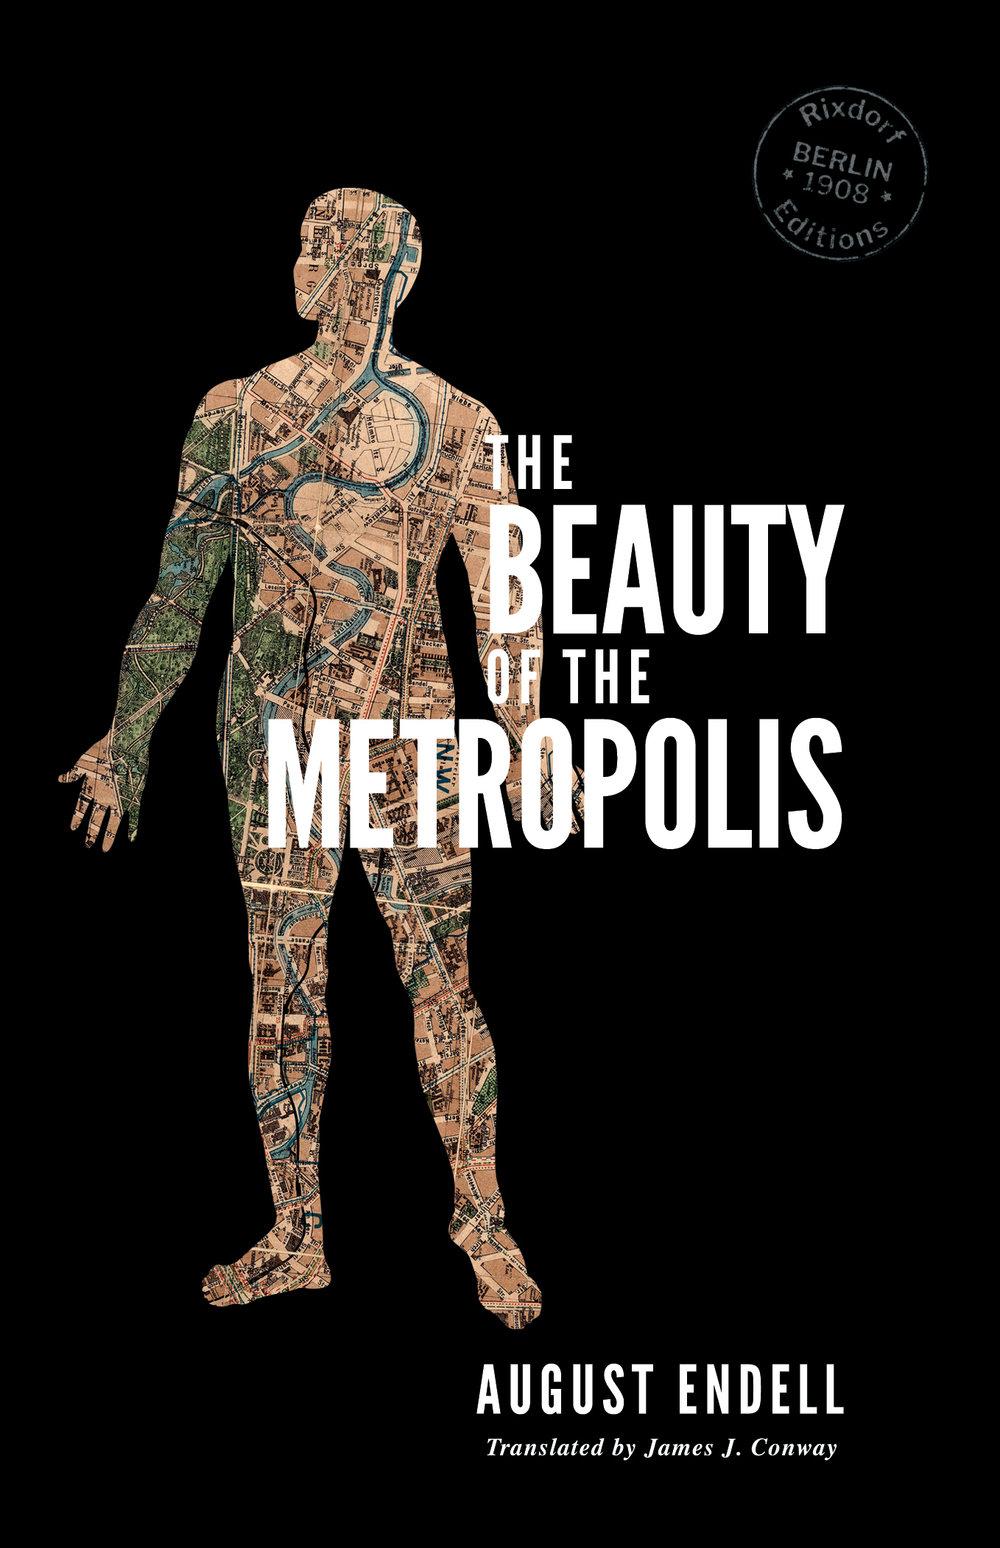 Beauty of the Metropolis Endell high-res.jpg